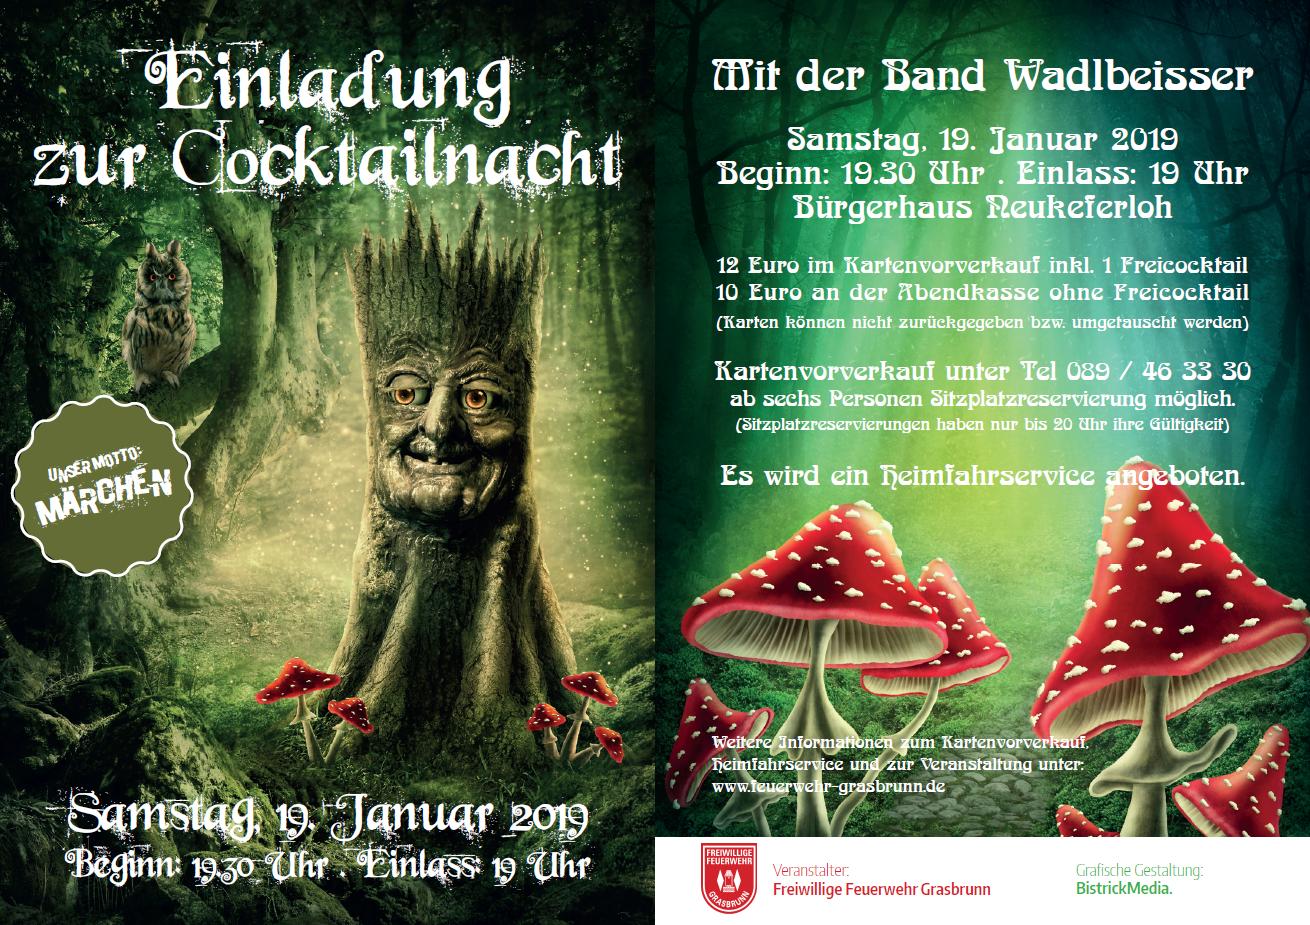 Cocktailnacht 2019 @ Bürgerhaus Neukeferloh